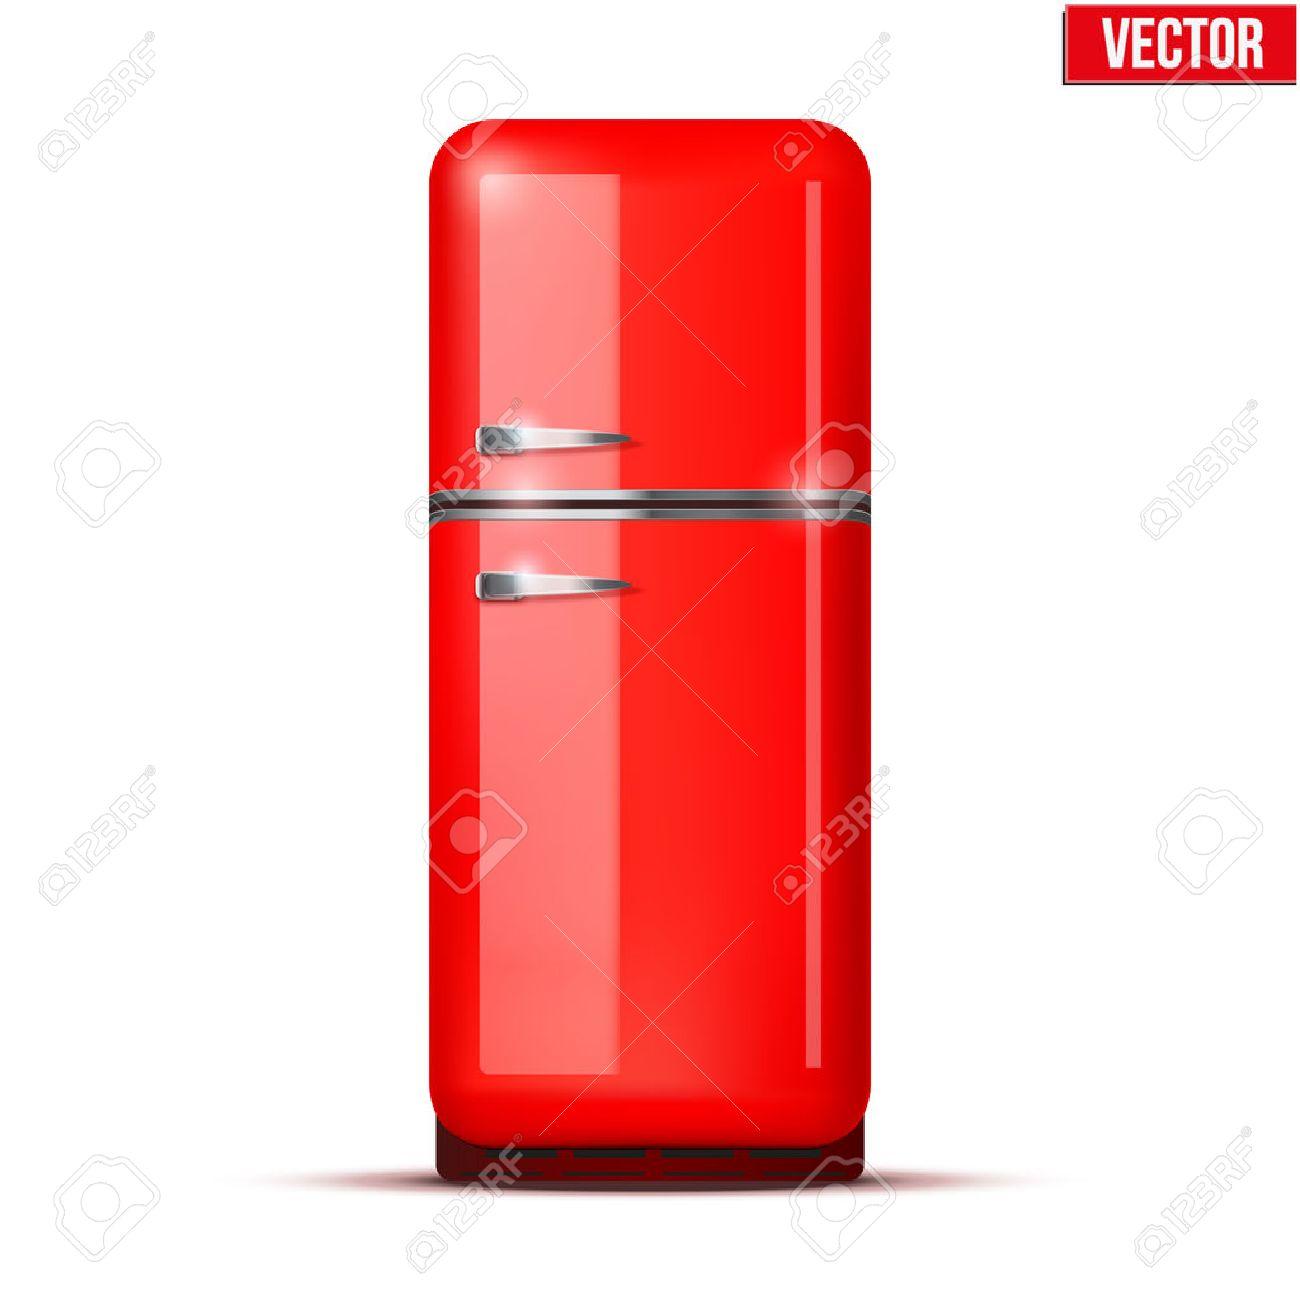 Retro Kühlschrank Kühlschrank Im Retro-Farben Rot Haushaltsgeräte ...